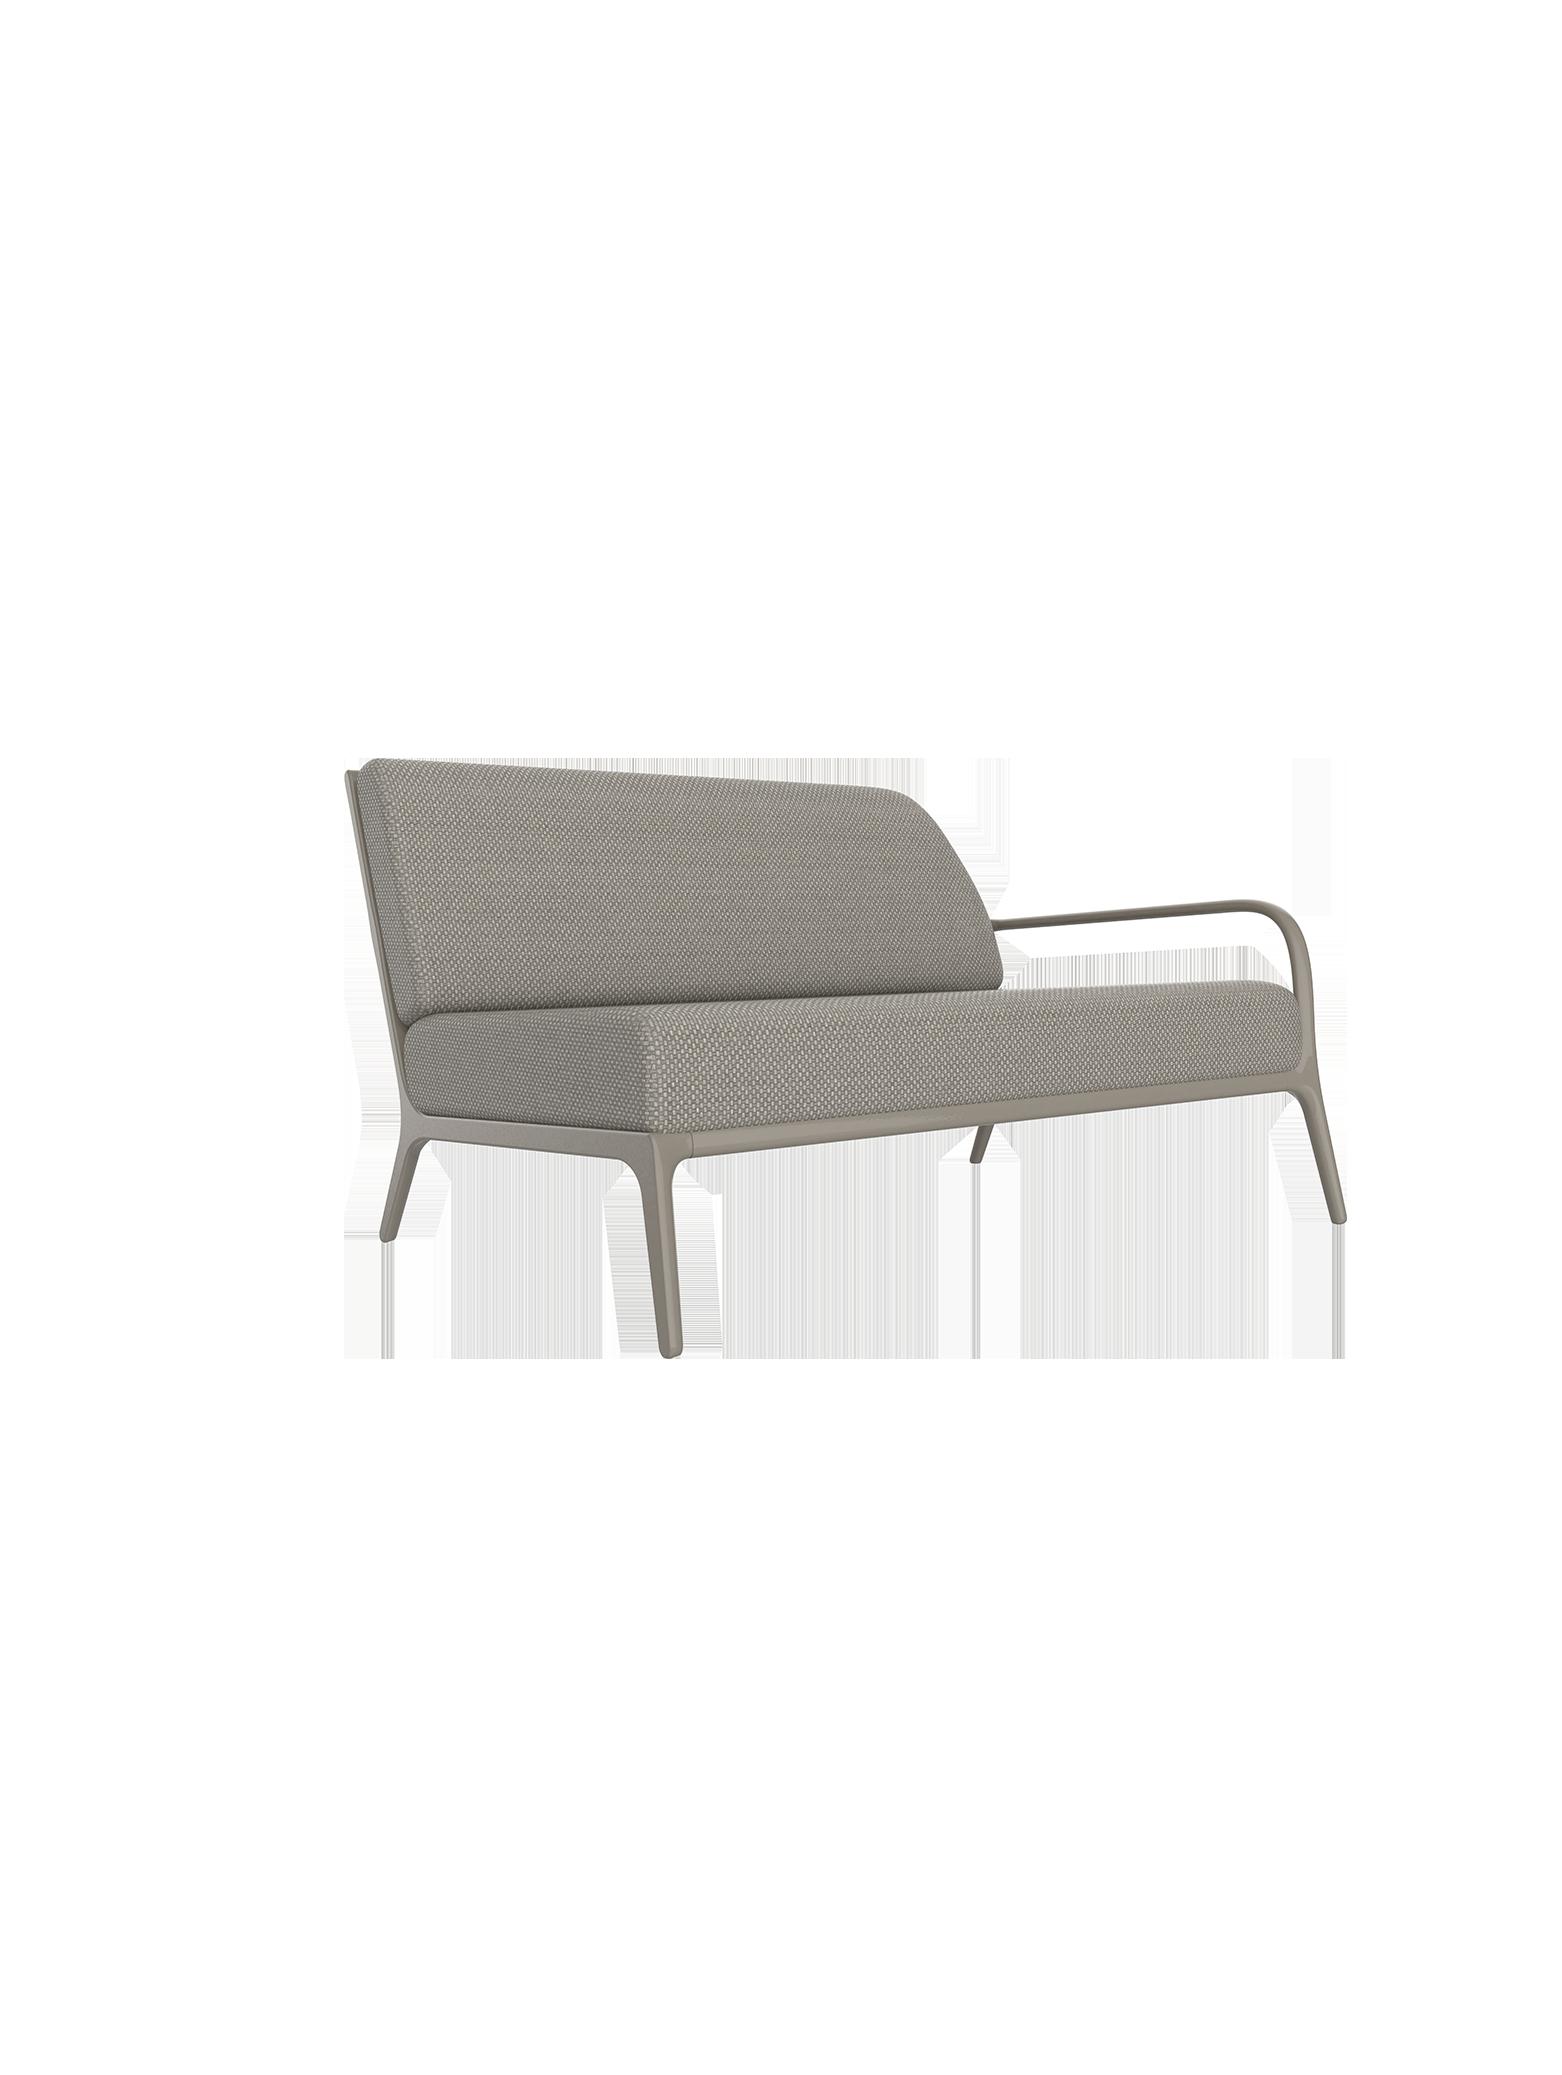 Sofá Modular Izquierdo 160